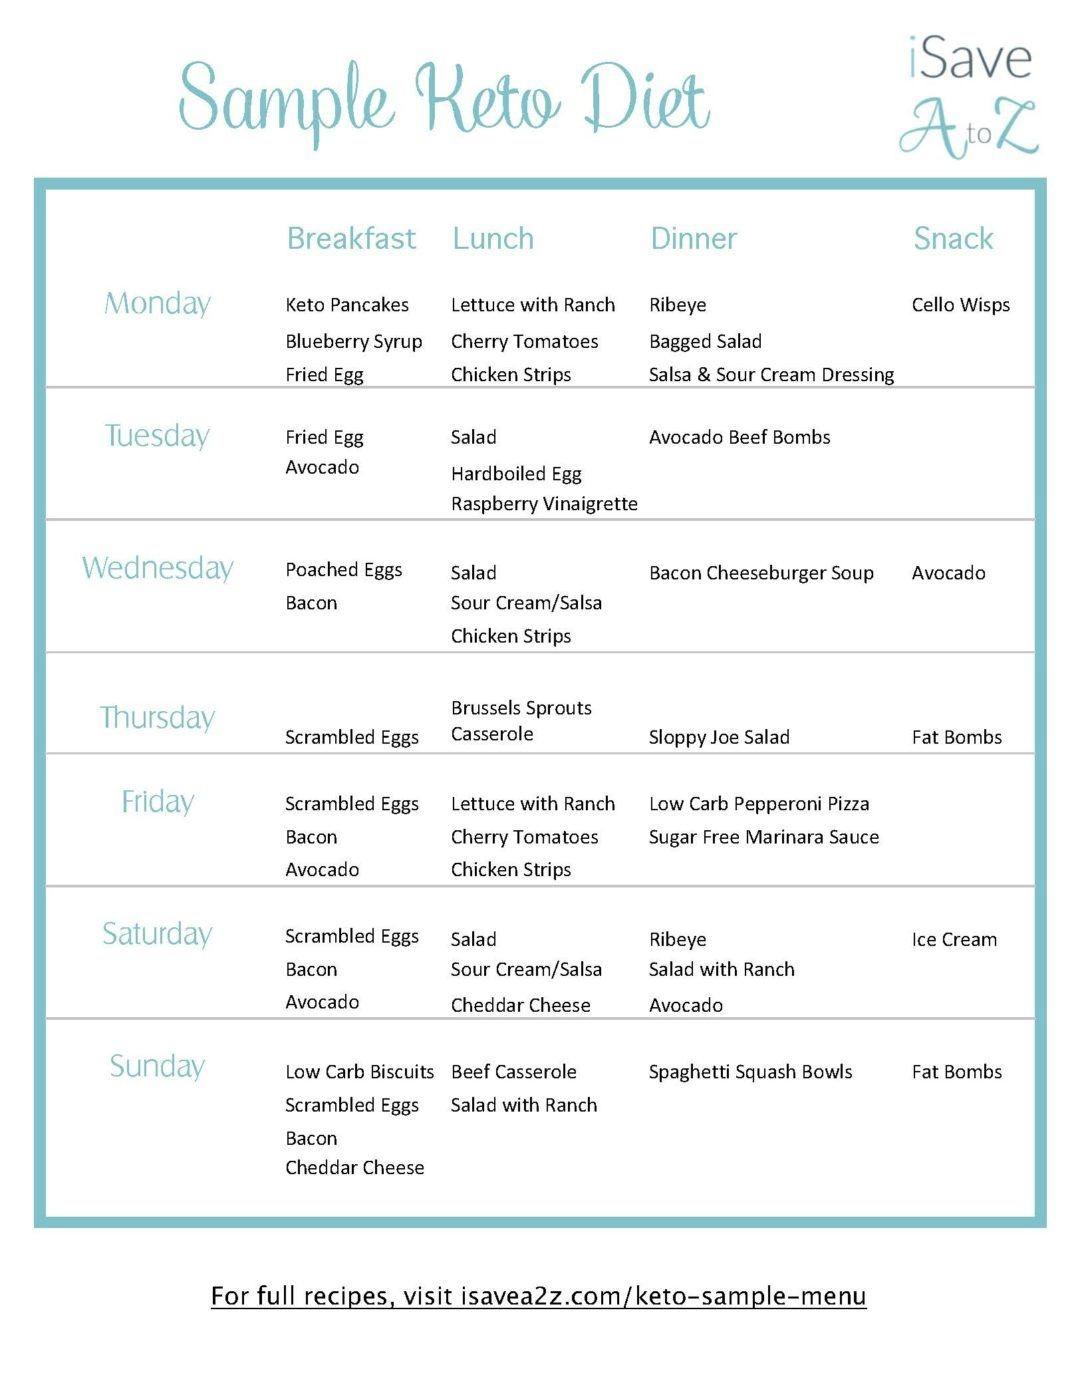 Grab This Printable 7 Day Keto Sample Menu Plan | Keto | Keto, Keto - Free Printable Atkins Diet Plan